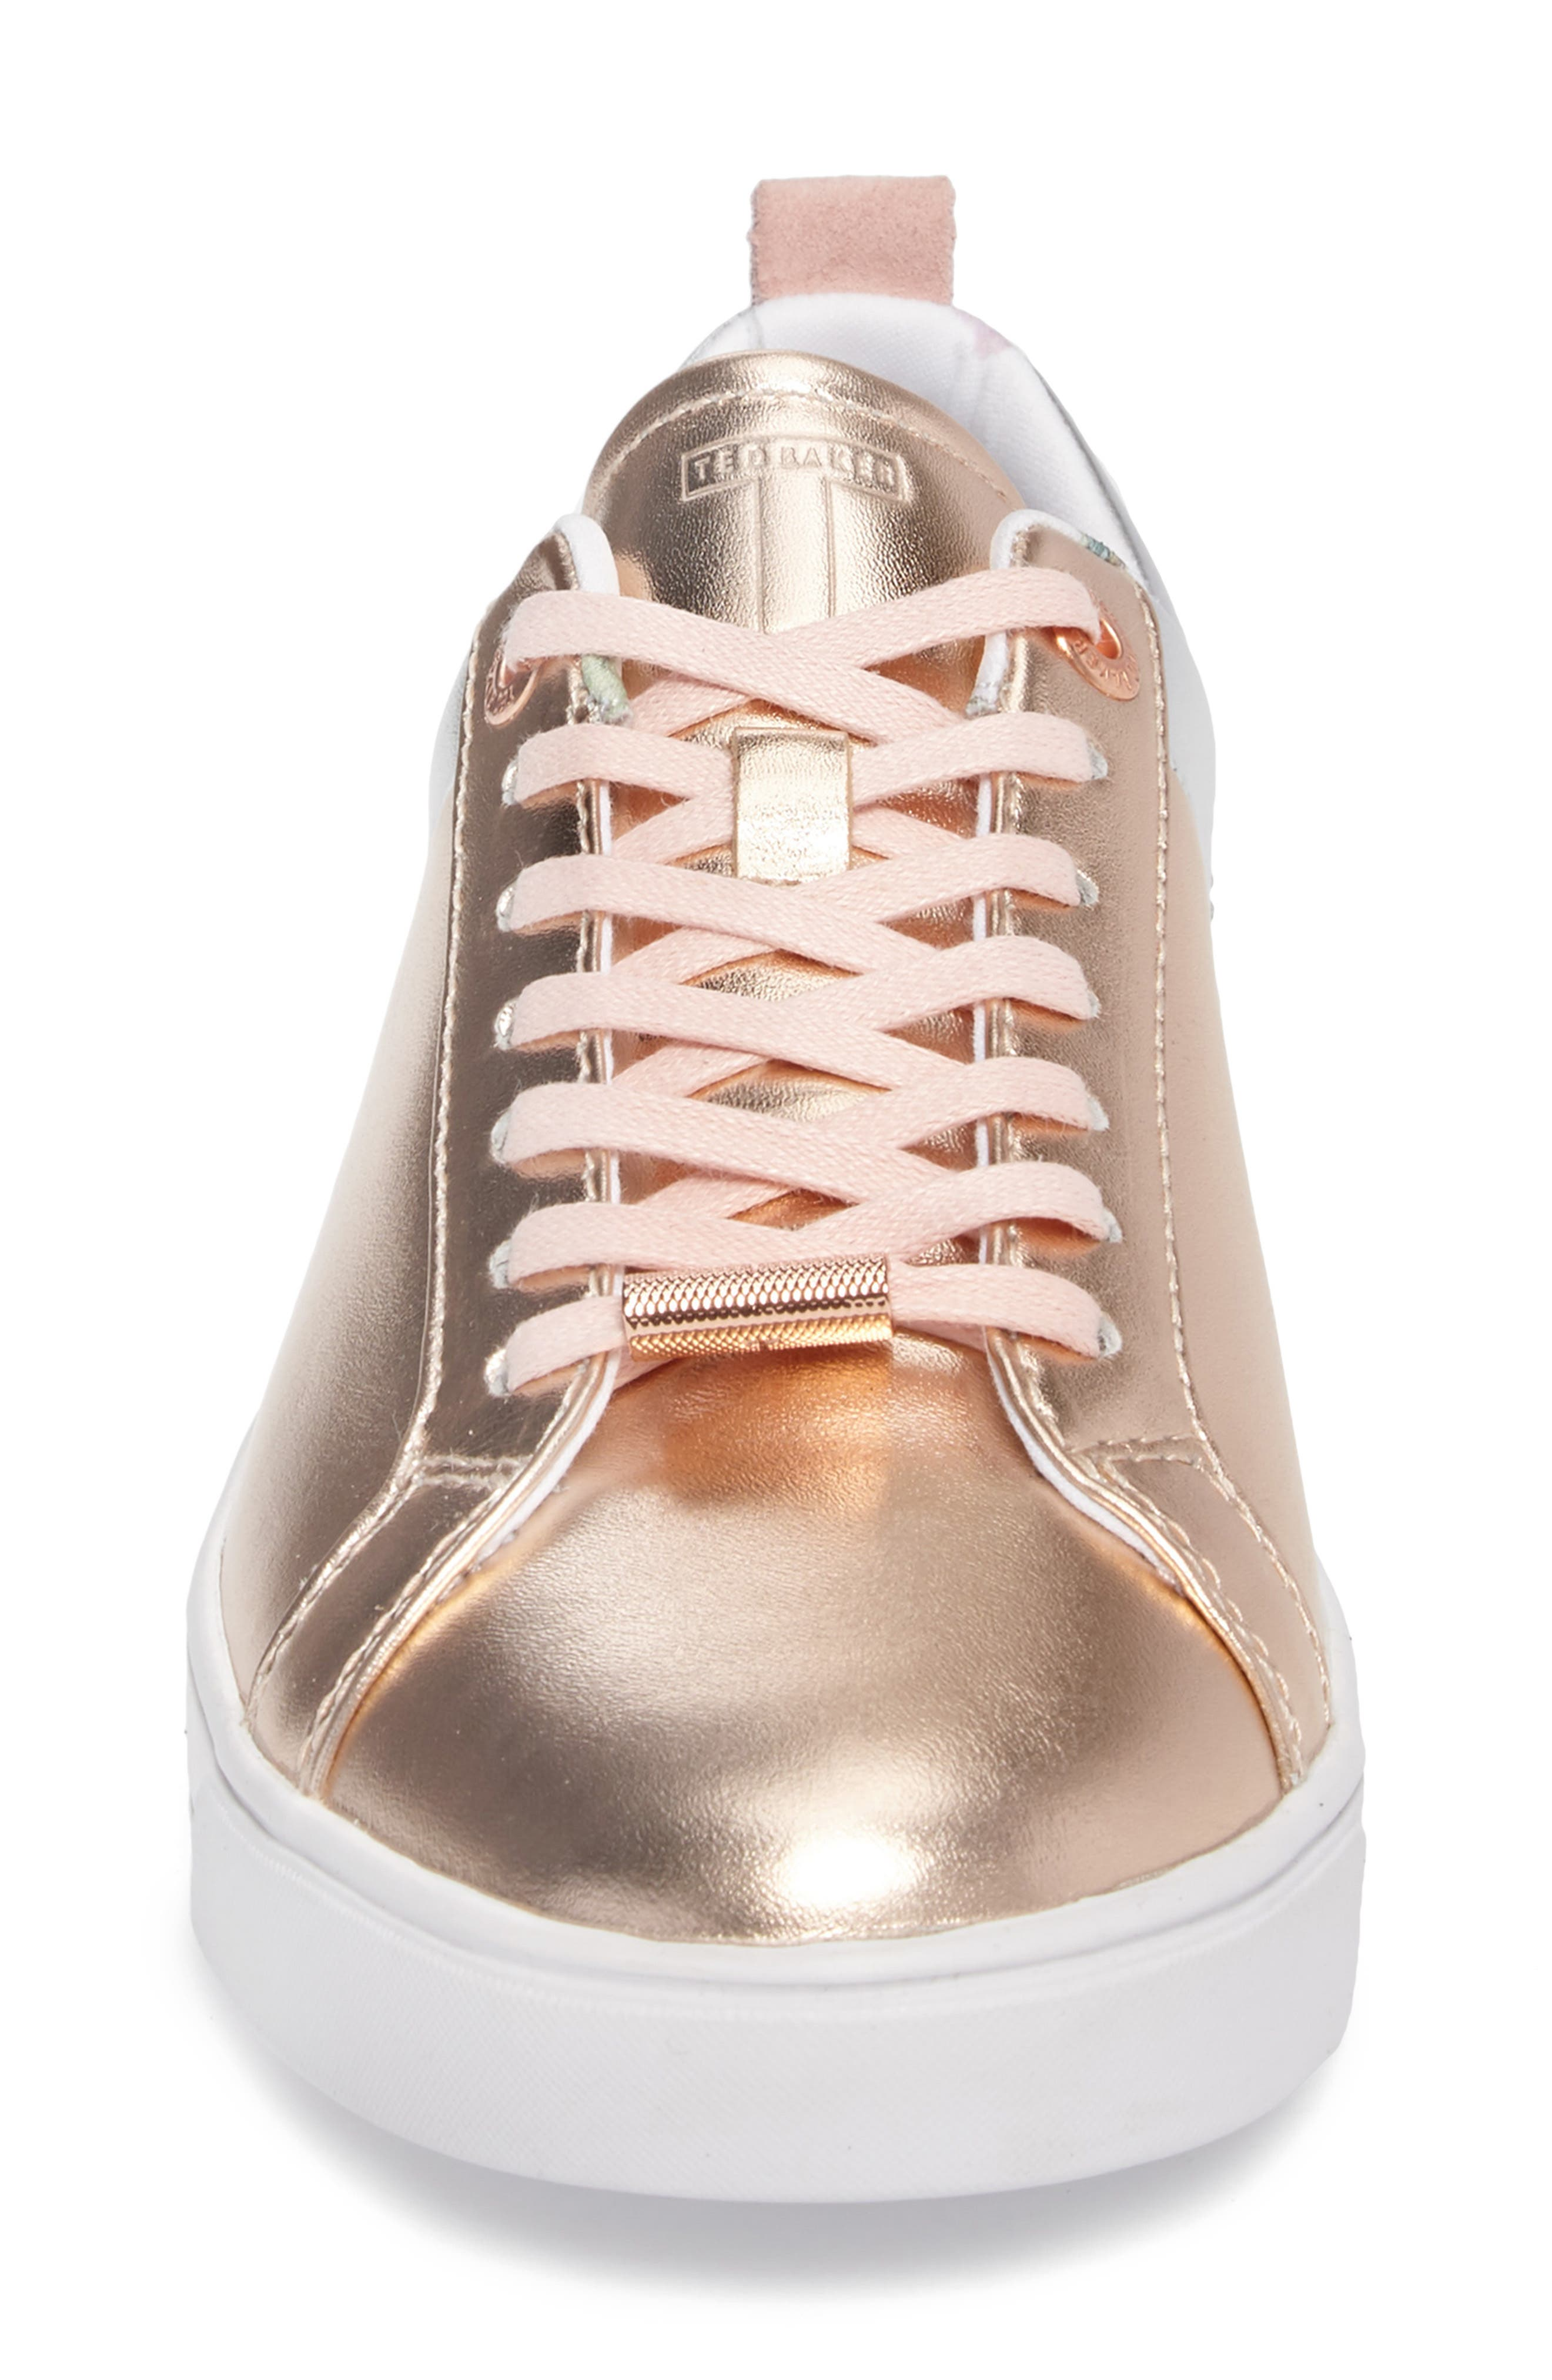 Kulei Lace-Up Sneaker,                             Alternate thumbnail 8, color,